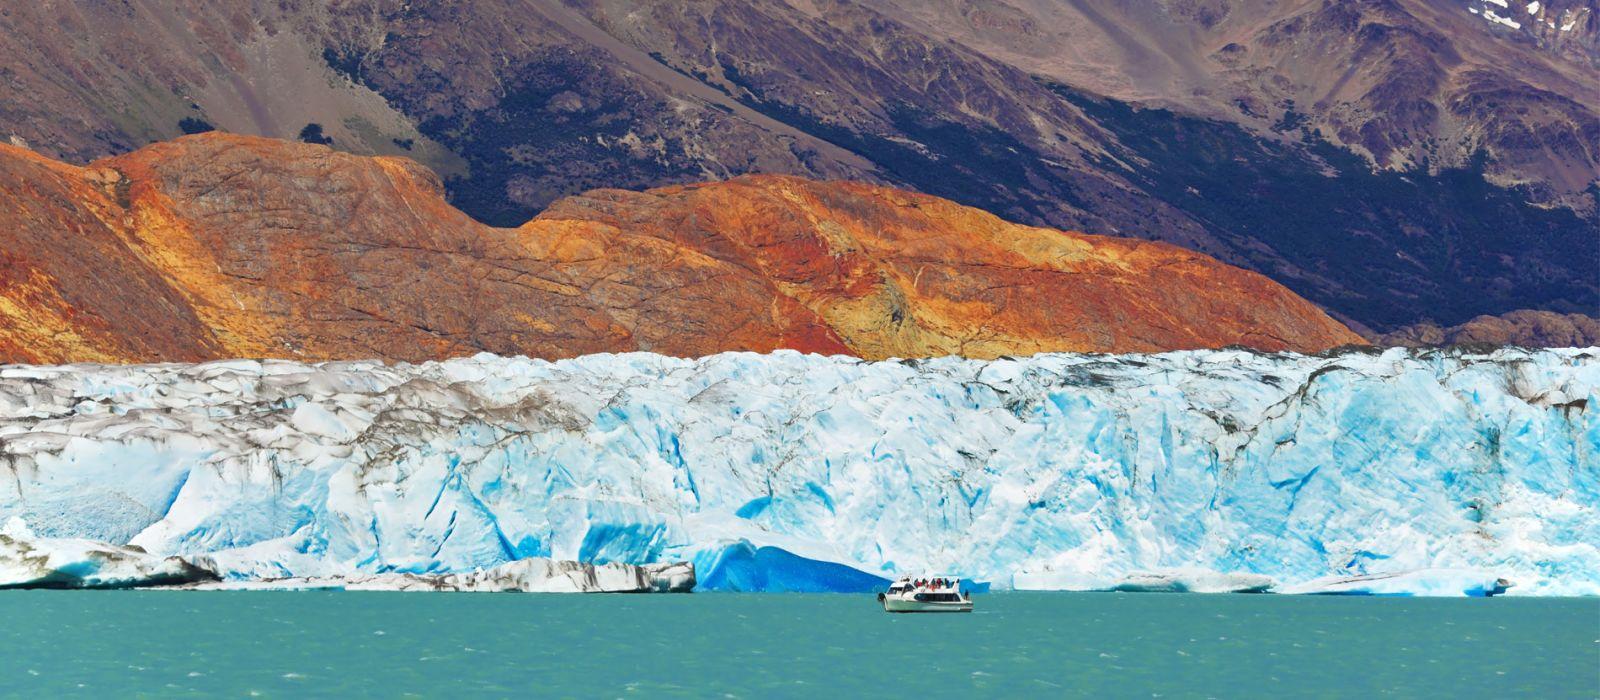 Destination Lago Viedma Argentina